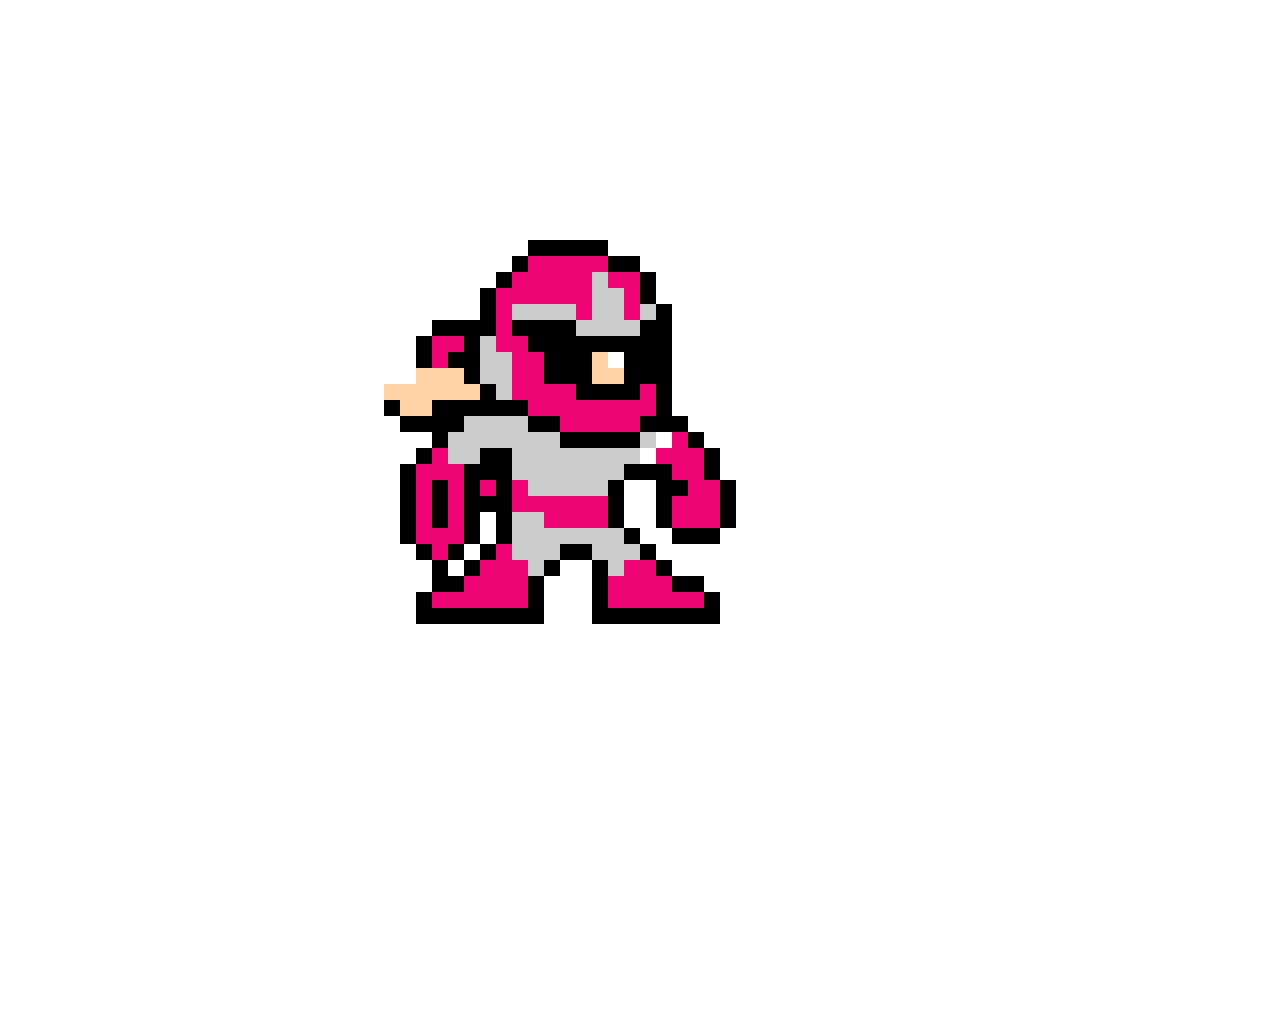 Proto Man (Break Man Form Mega Man 3)